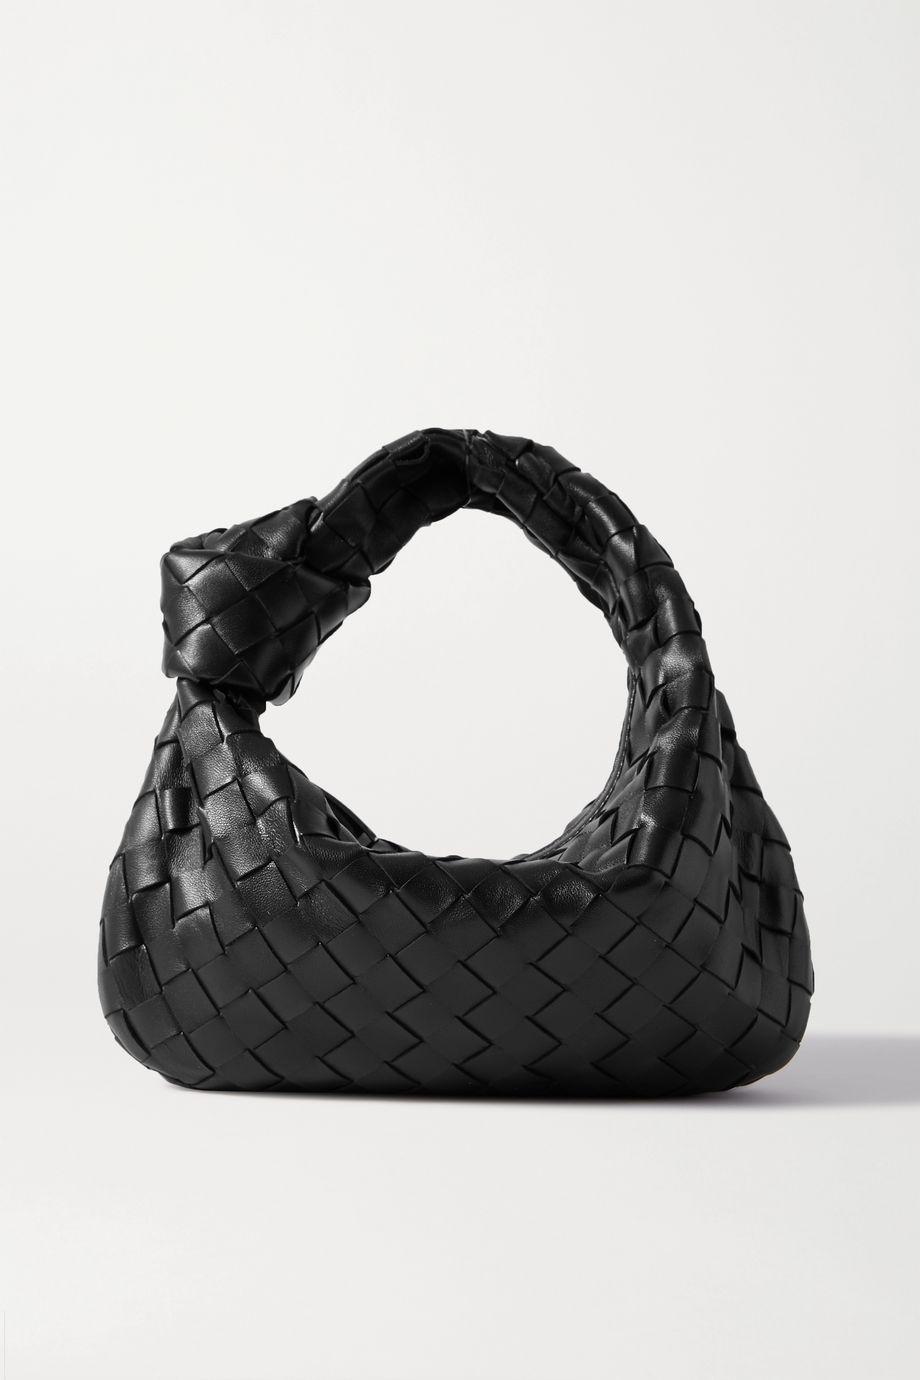 Bottega Veneta Jodie mini Tote aus strukturiertem Intrecciato-Leder mit Knoten